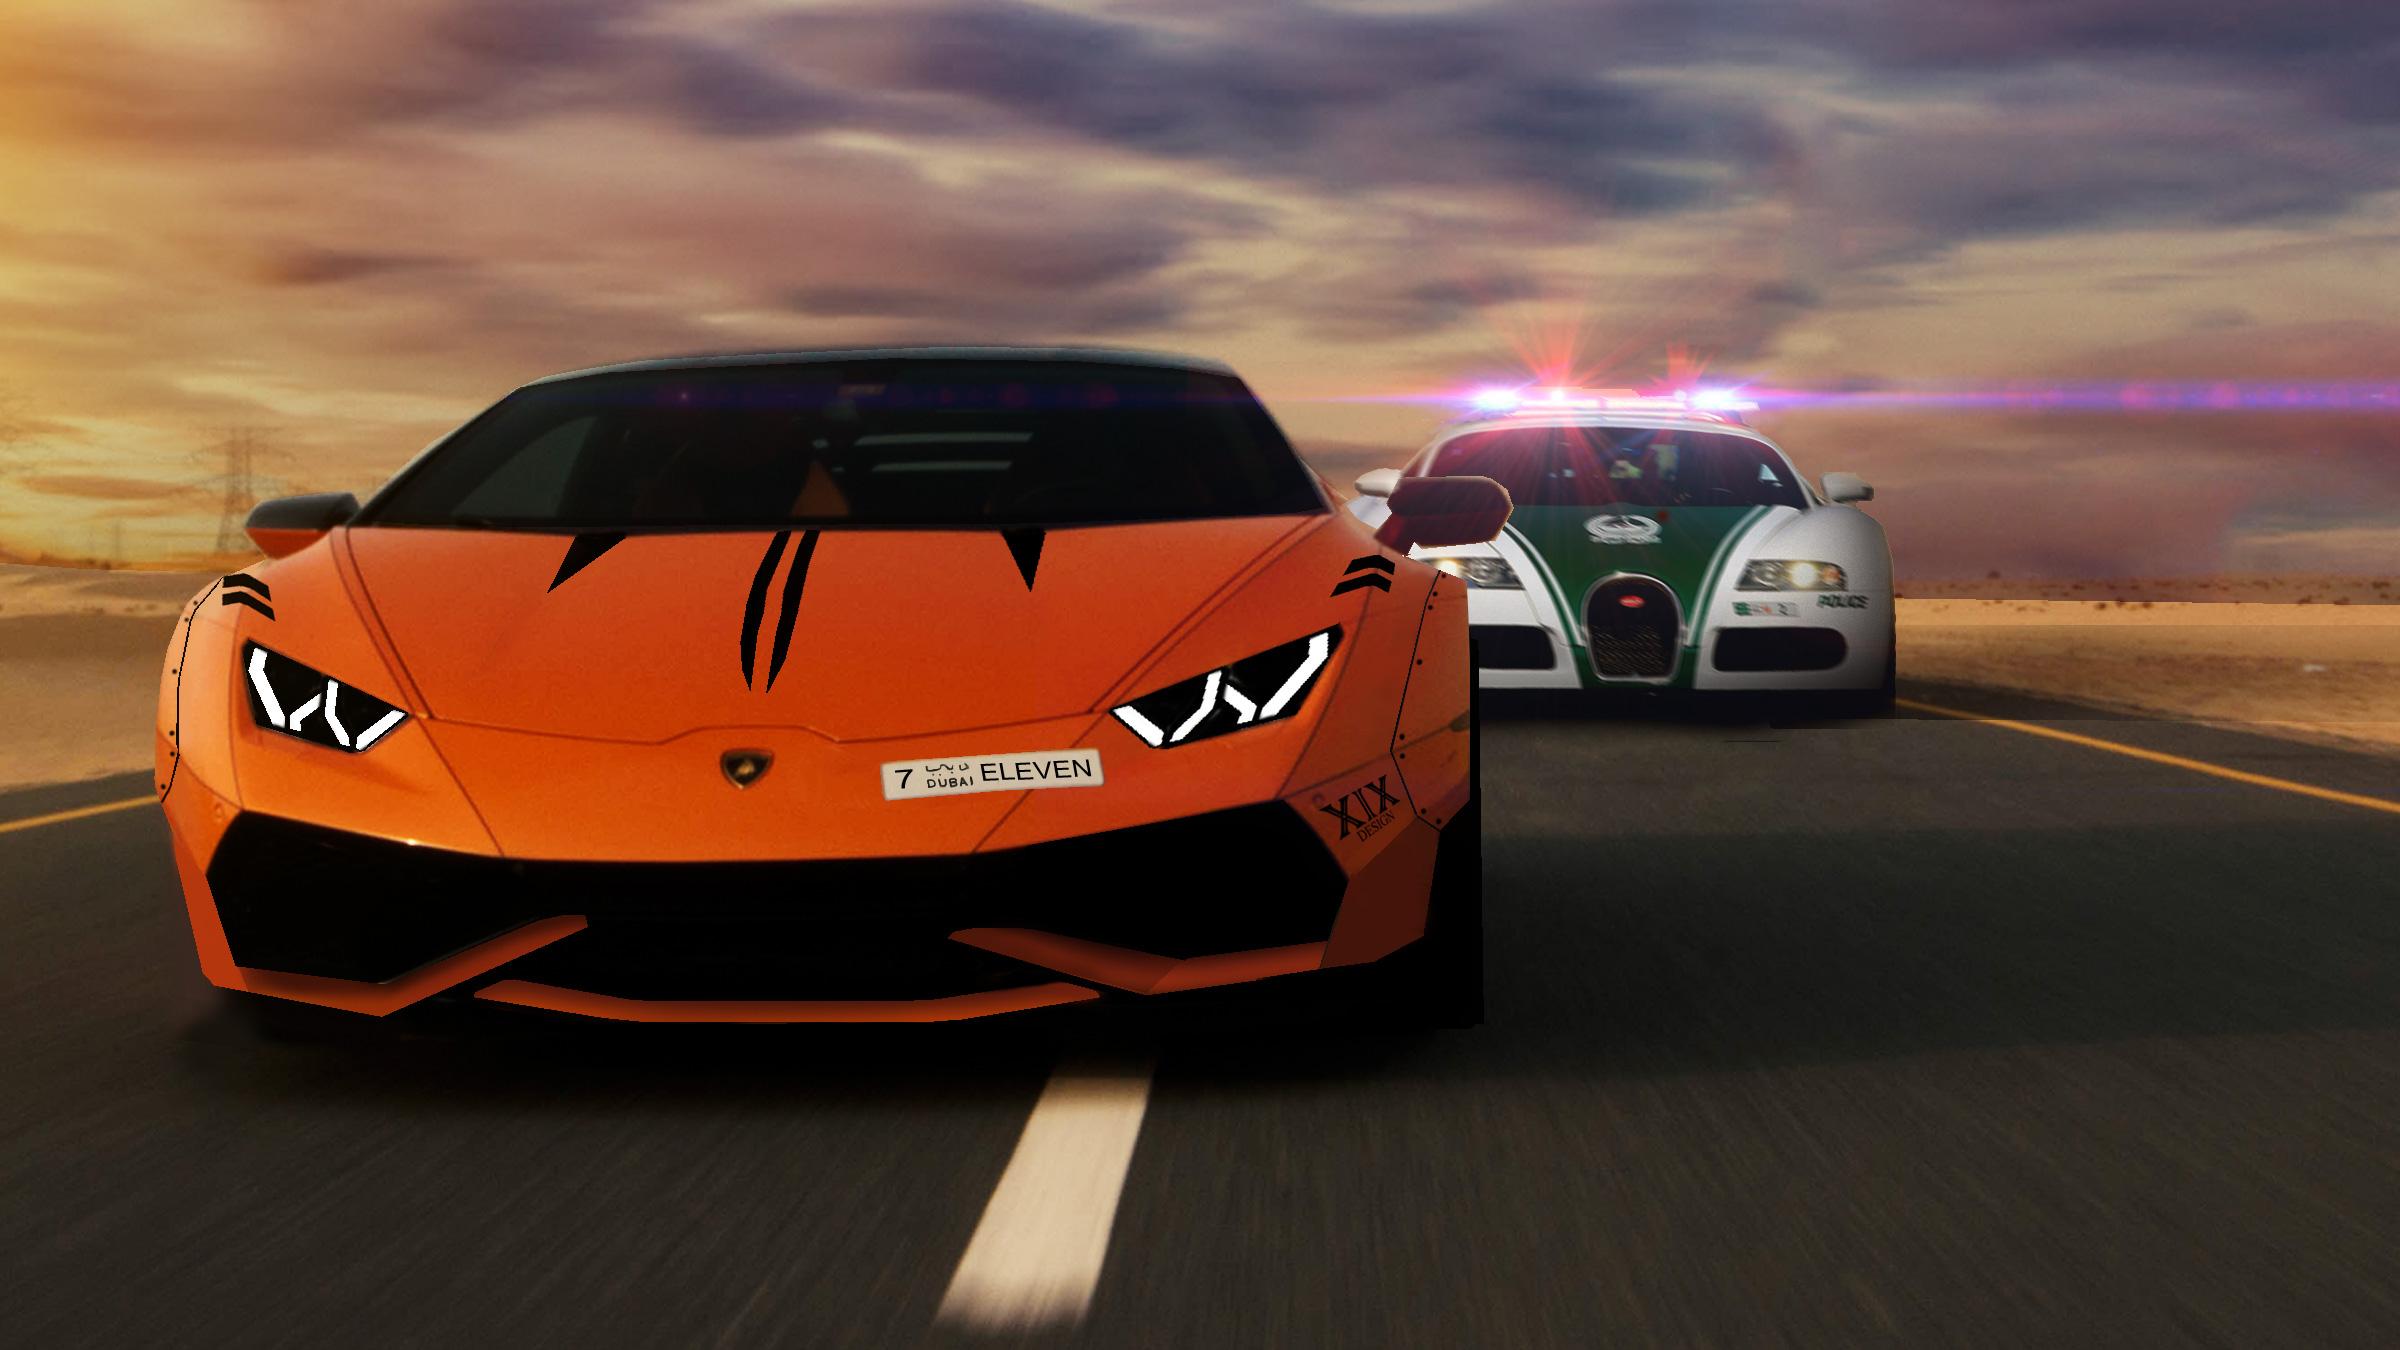 Lamborghini Robber And Bugatti Cop Hd Cars 4k Wallpapers Images